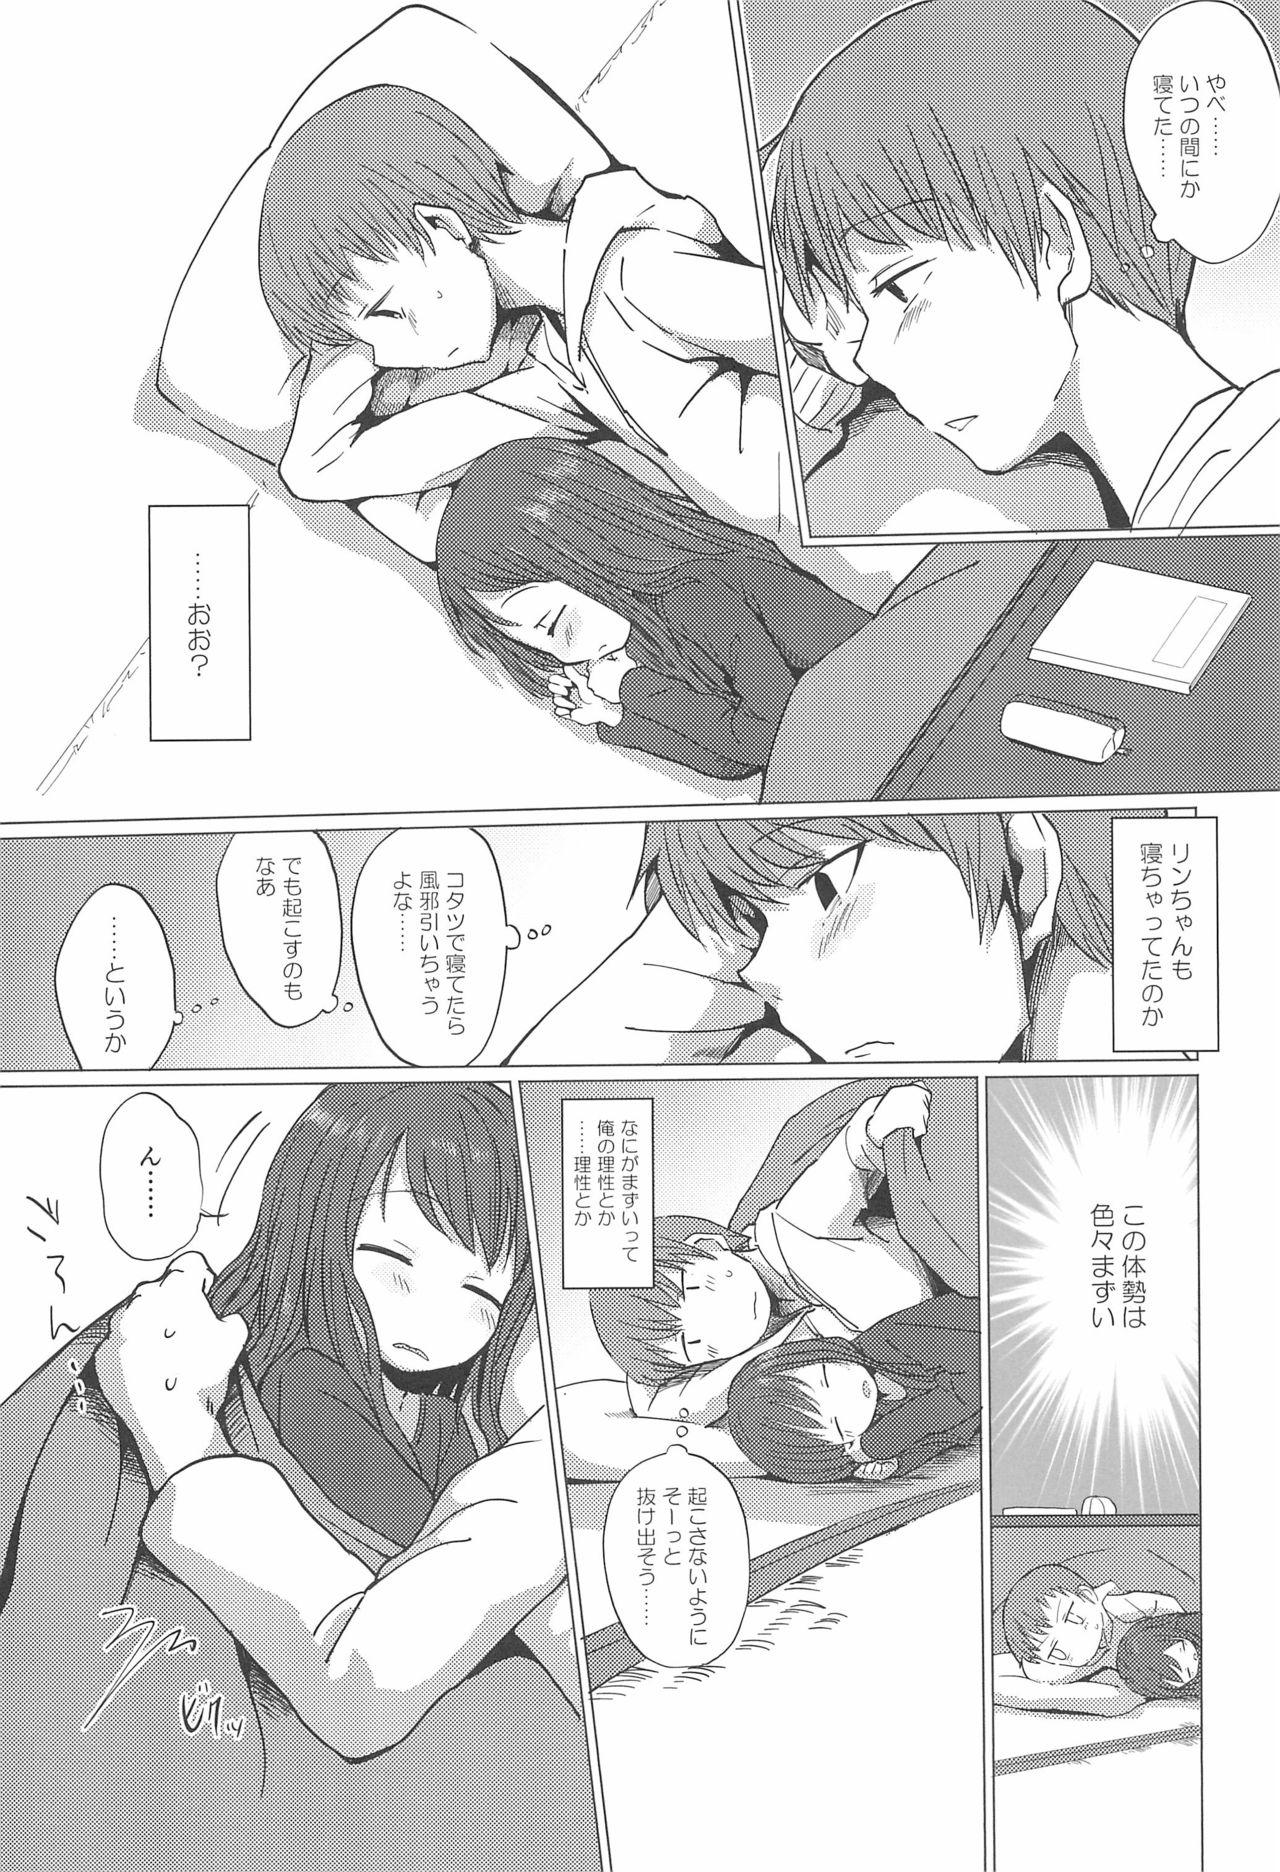 Fuyu wa Inaka ni Kaerou. 6